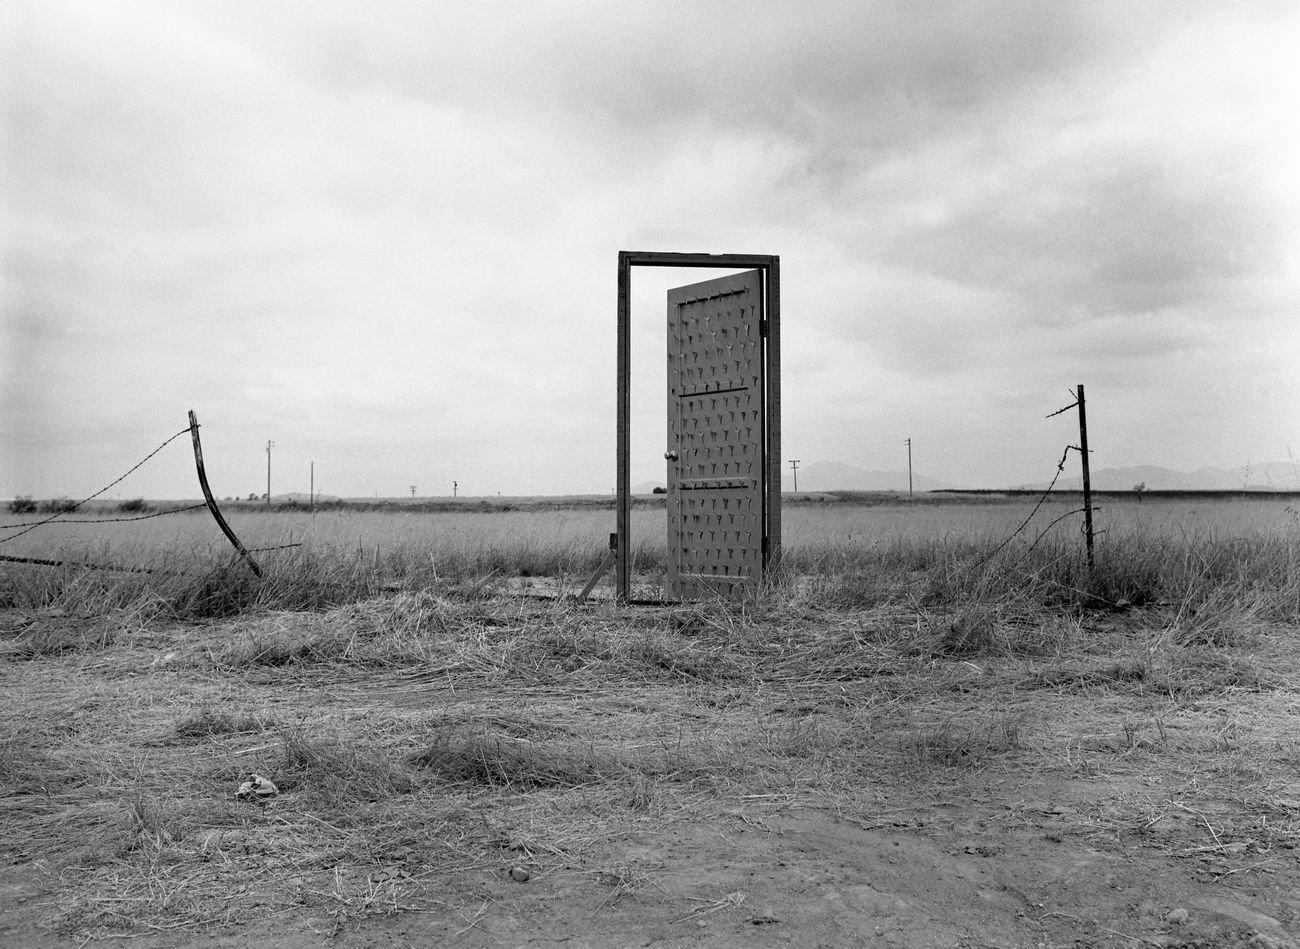 Richard Alexander Lou, The Border Door, 1986, porta in legno e chiavi (San Diego Tijuana). Courtesy l'artista